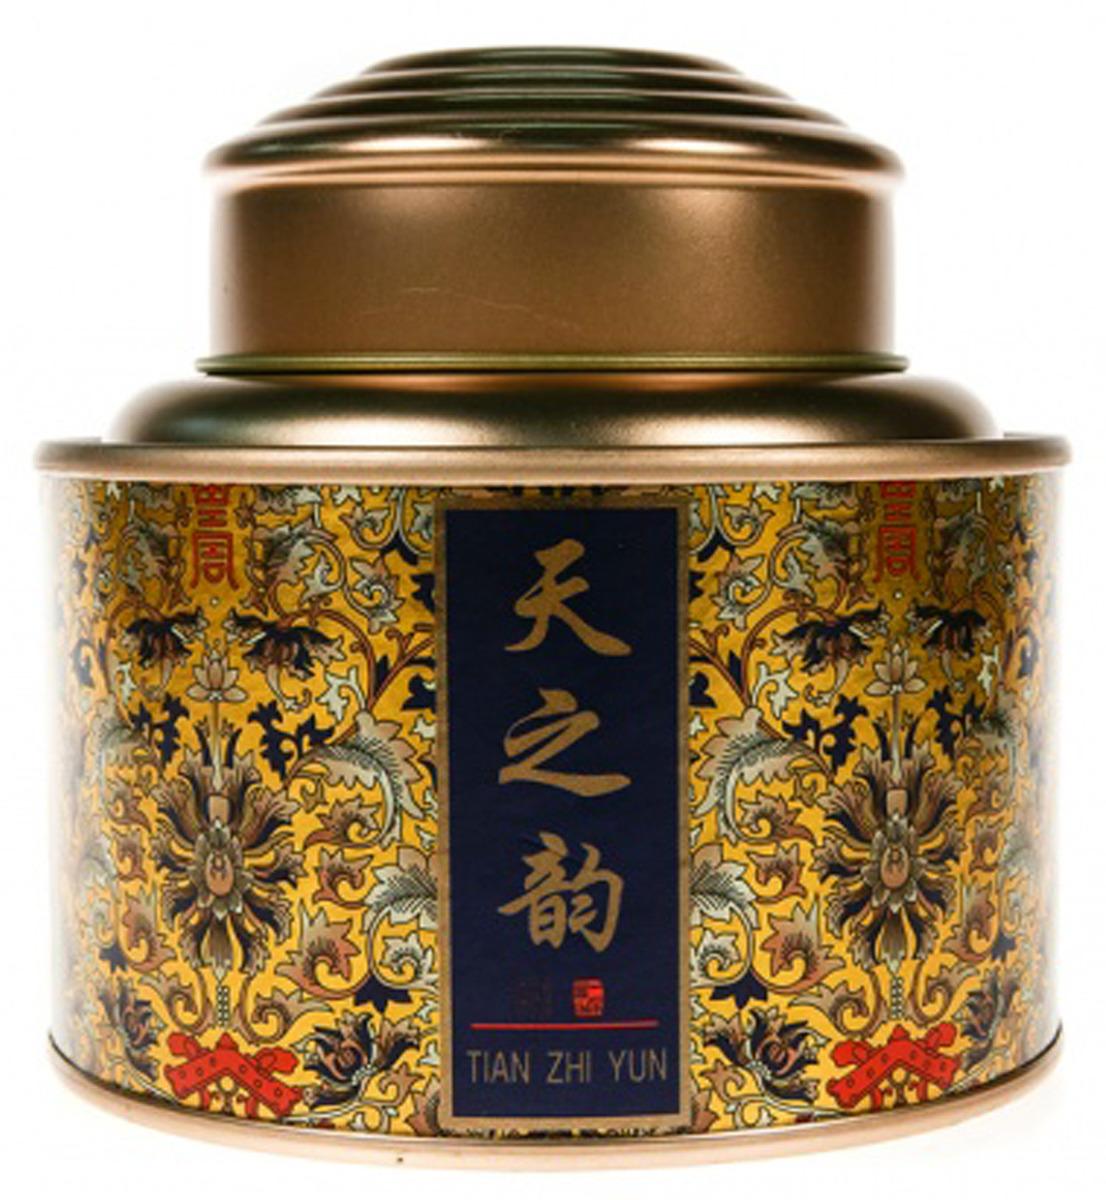 Чай листовой улун Тянь Юнь Дун Фан Мэй Жень Восточная красавица, 70 г цена и фото